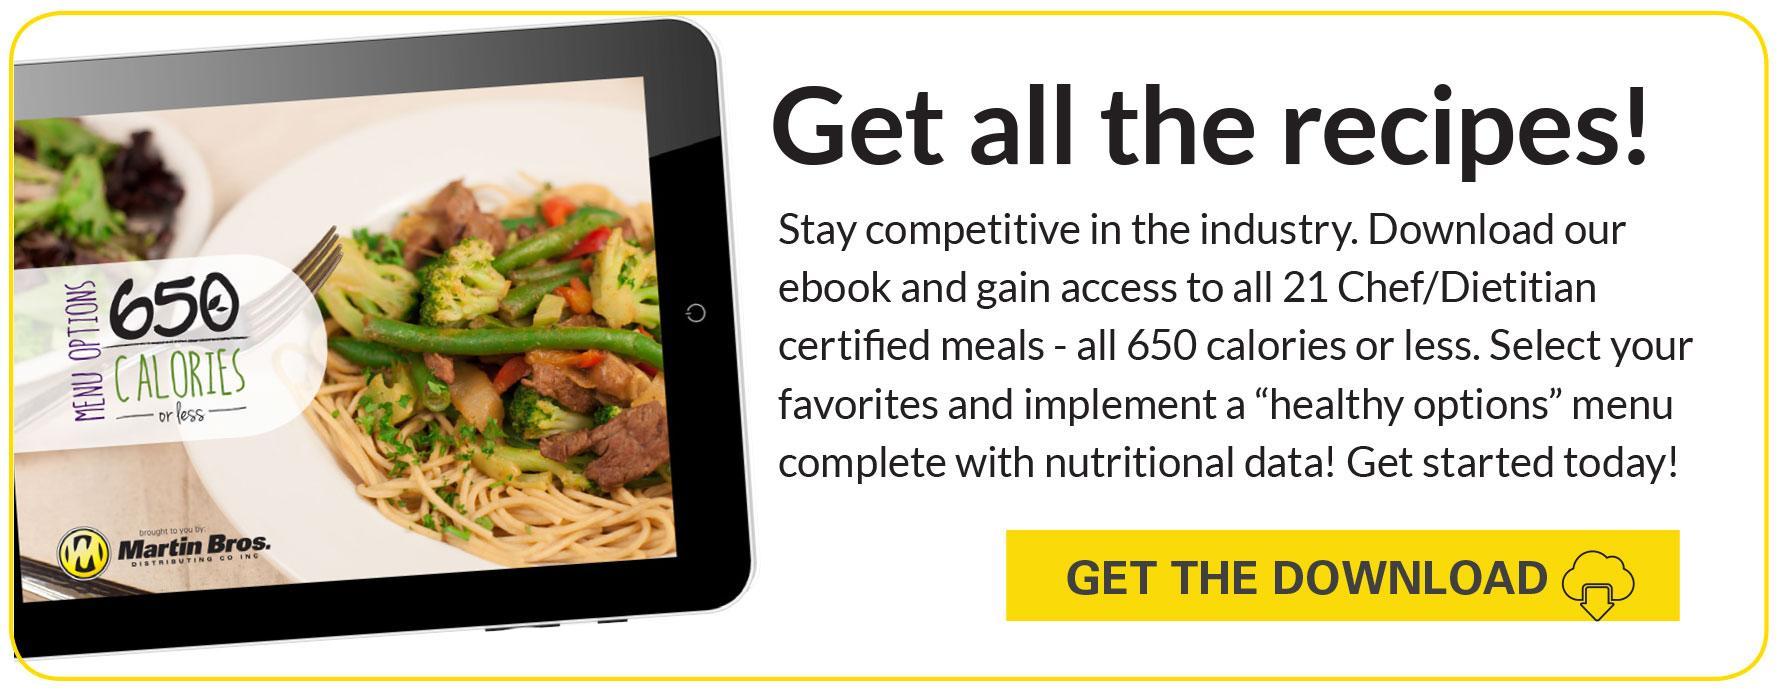 650 Calories or Less Ebook Download